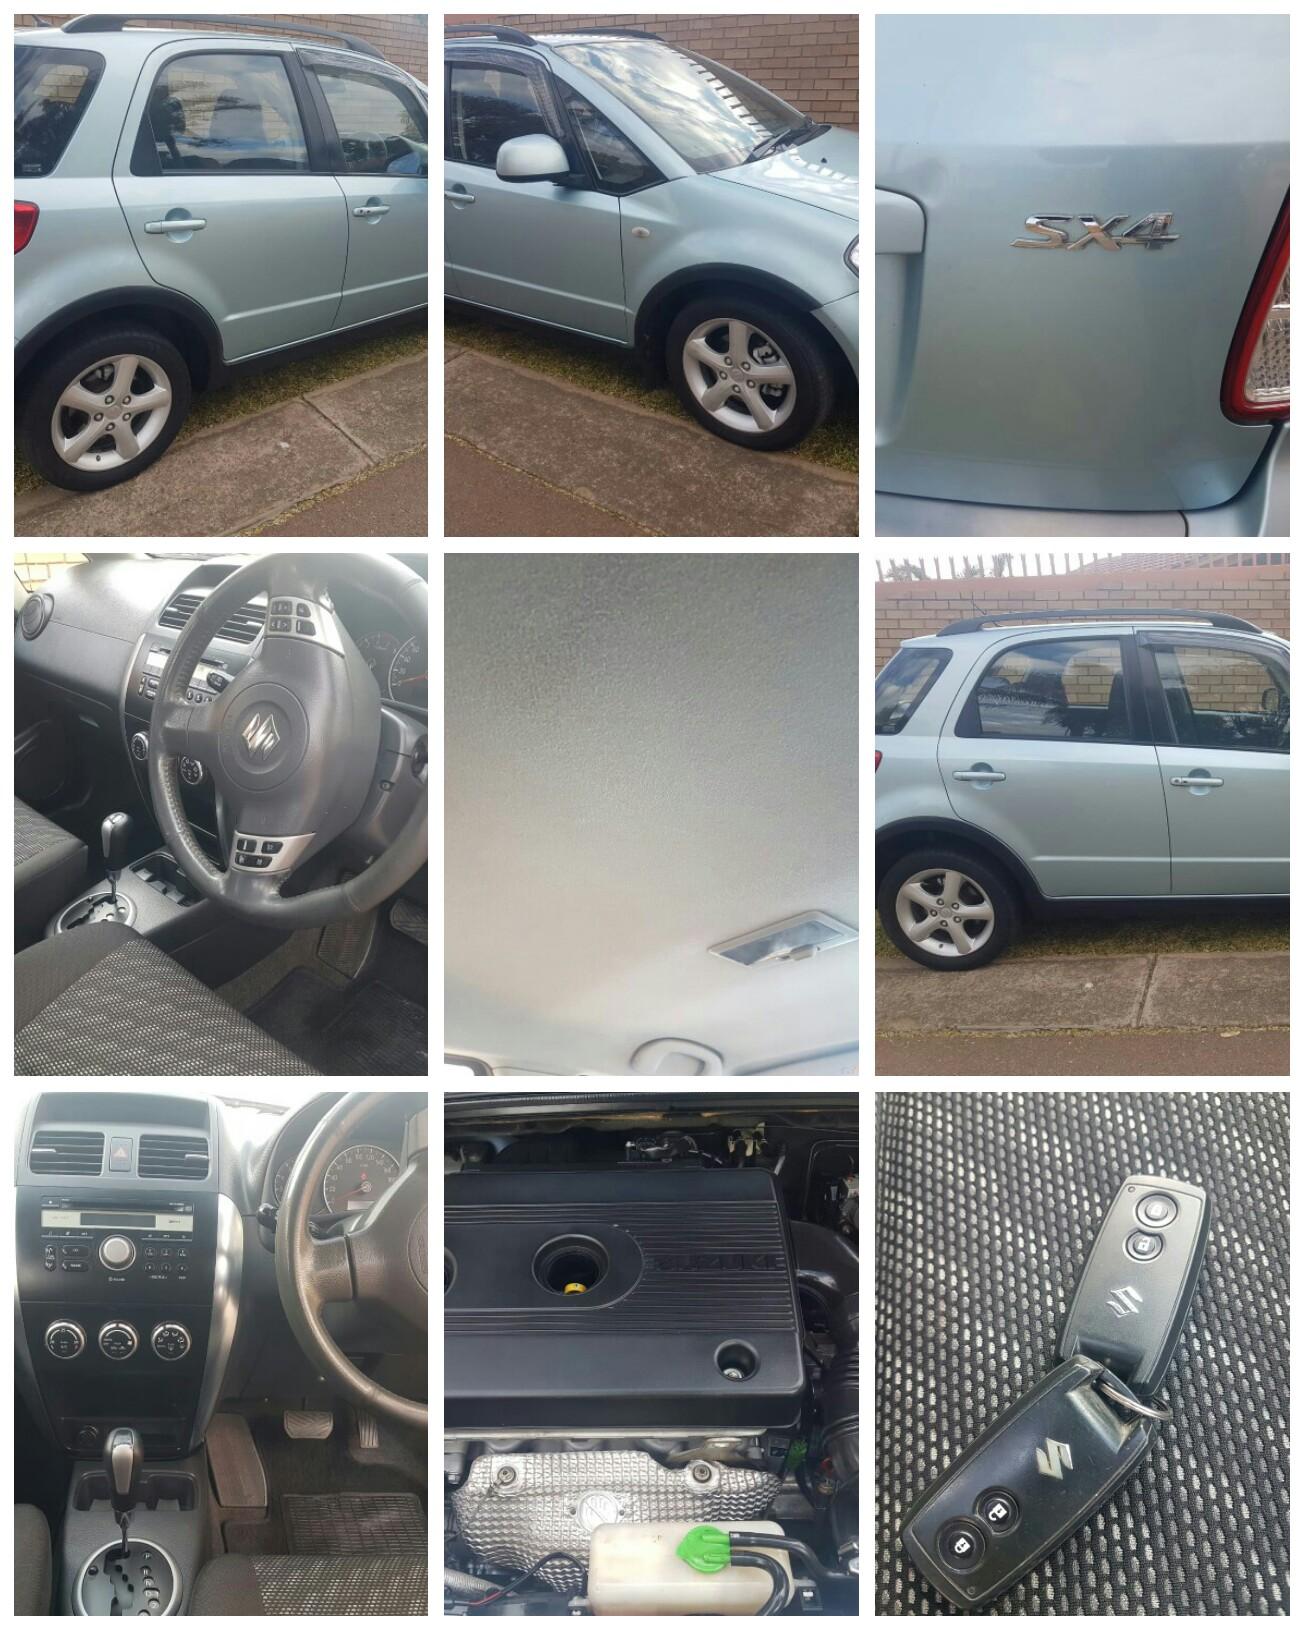 2008 Suzuki SX4 2.0 automatic